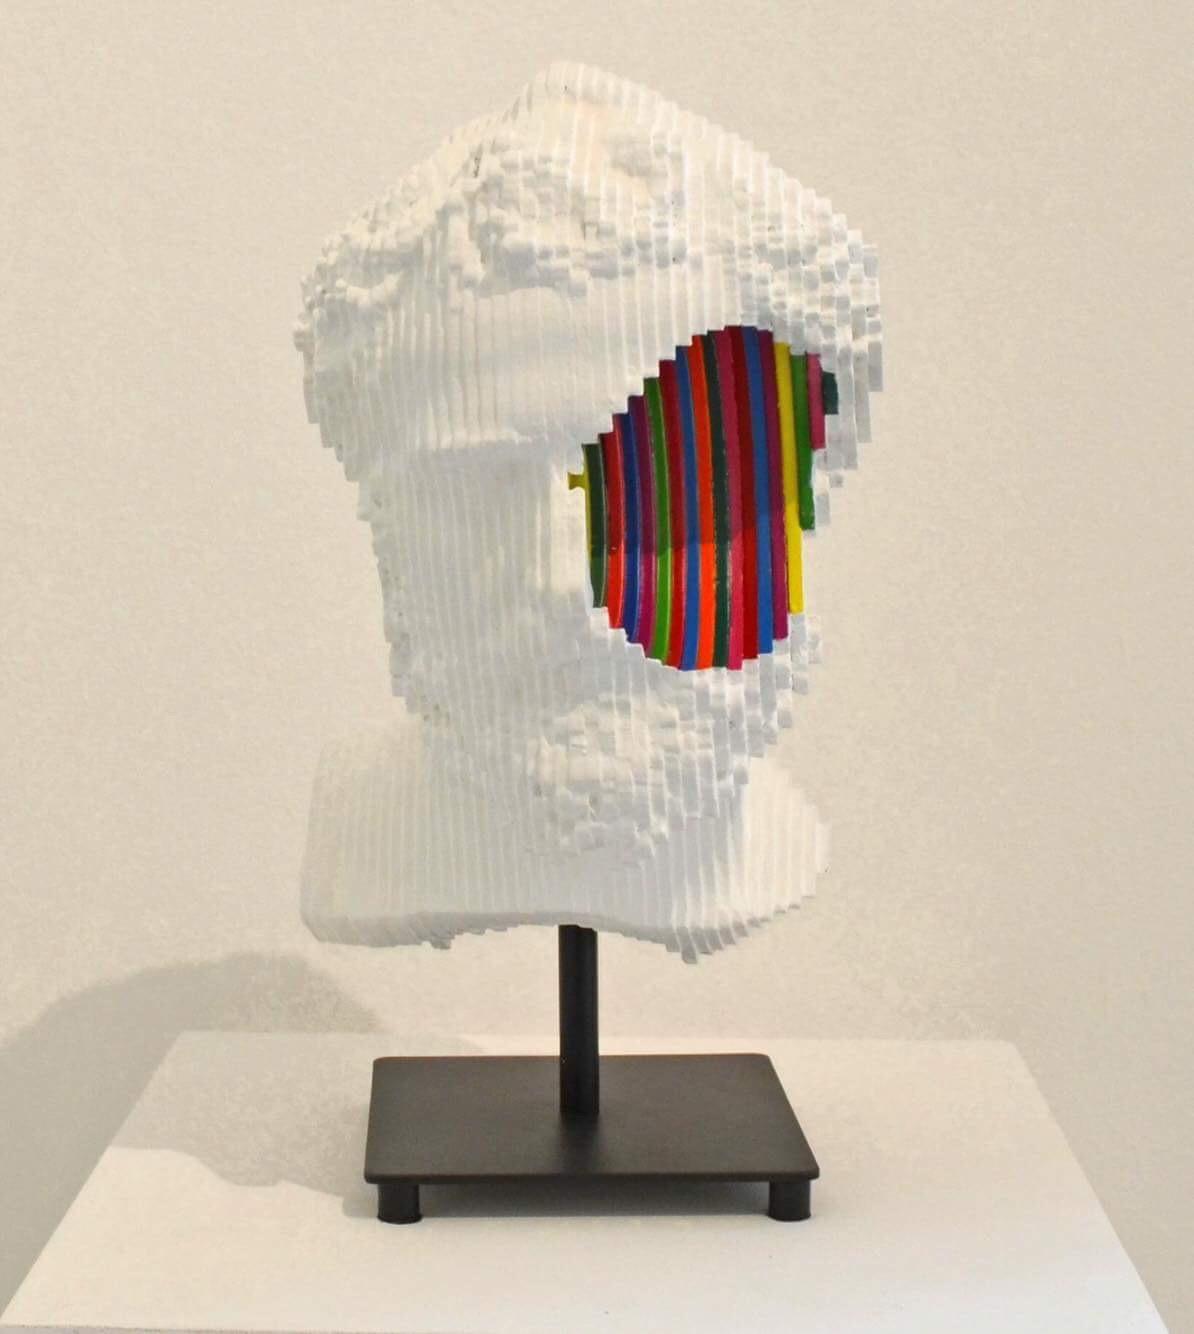 Daniele Fortuna ,Colormination inside, wood, 25x20x19cm, 2017